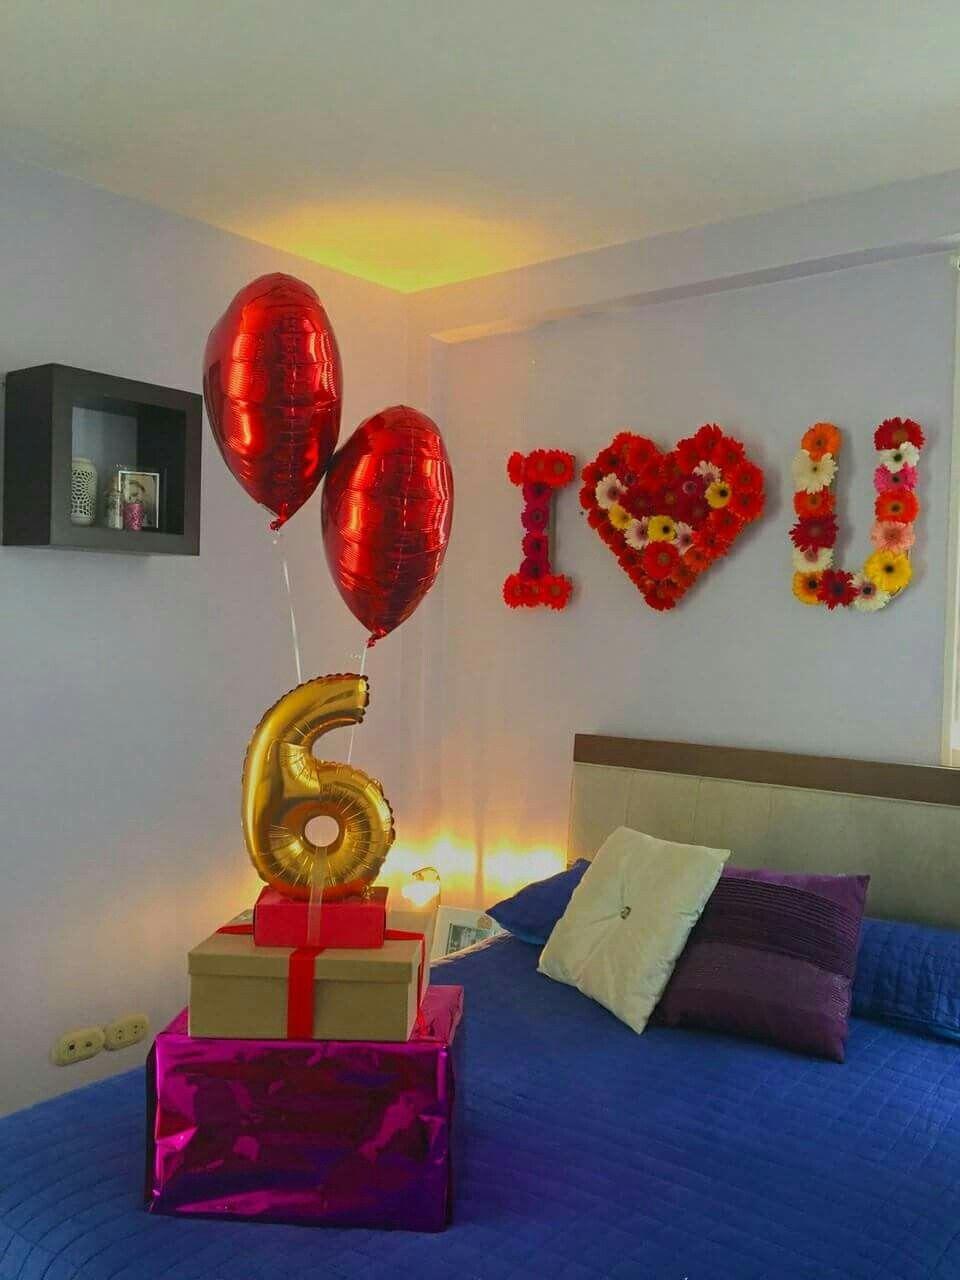 Pin de daniela bermudez en rinc n de sue os regalo for Sorpresas para aniversario